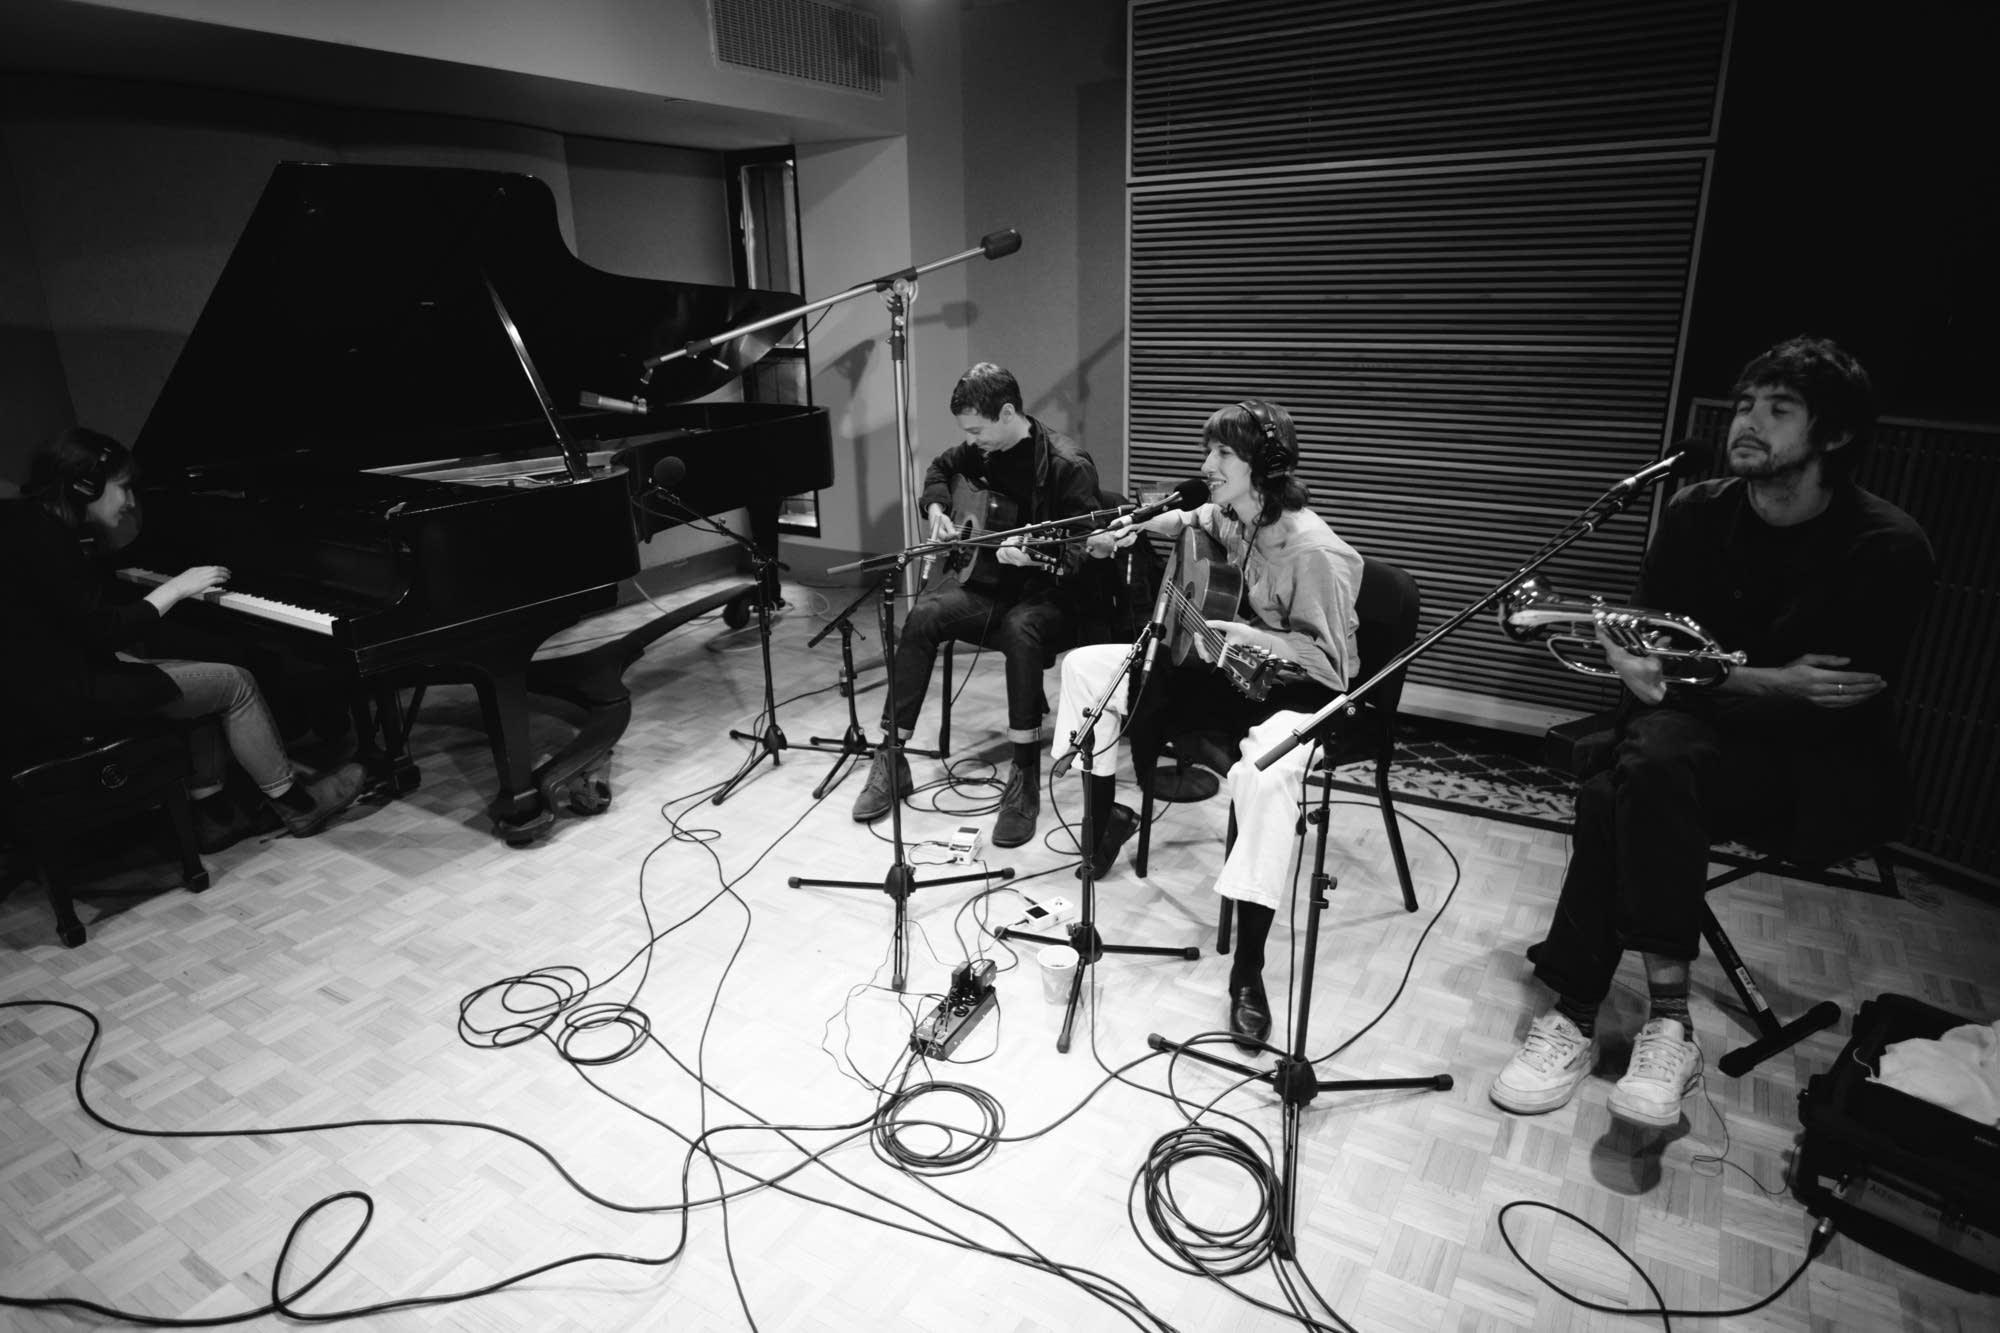 Aldous Harding performing in The Current studio